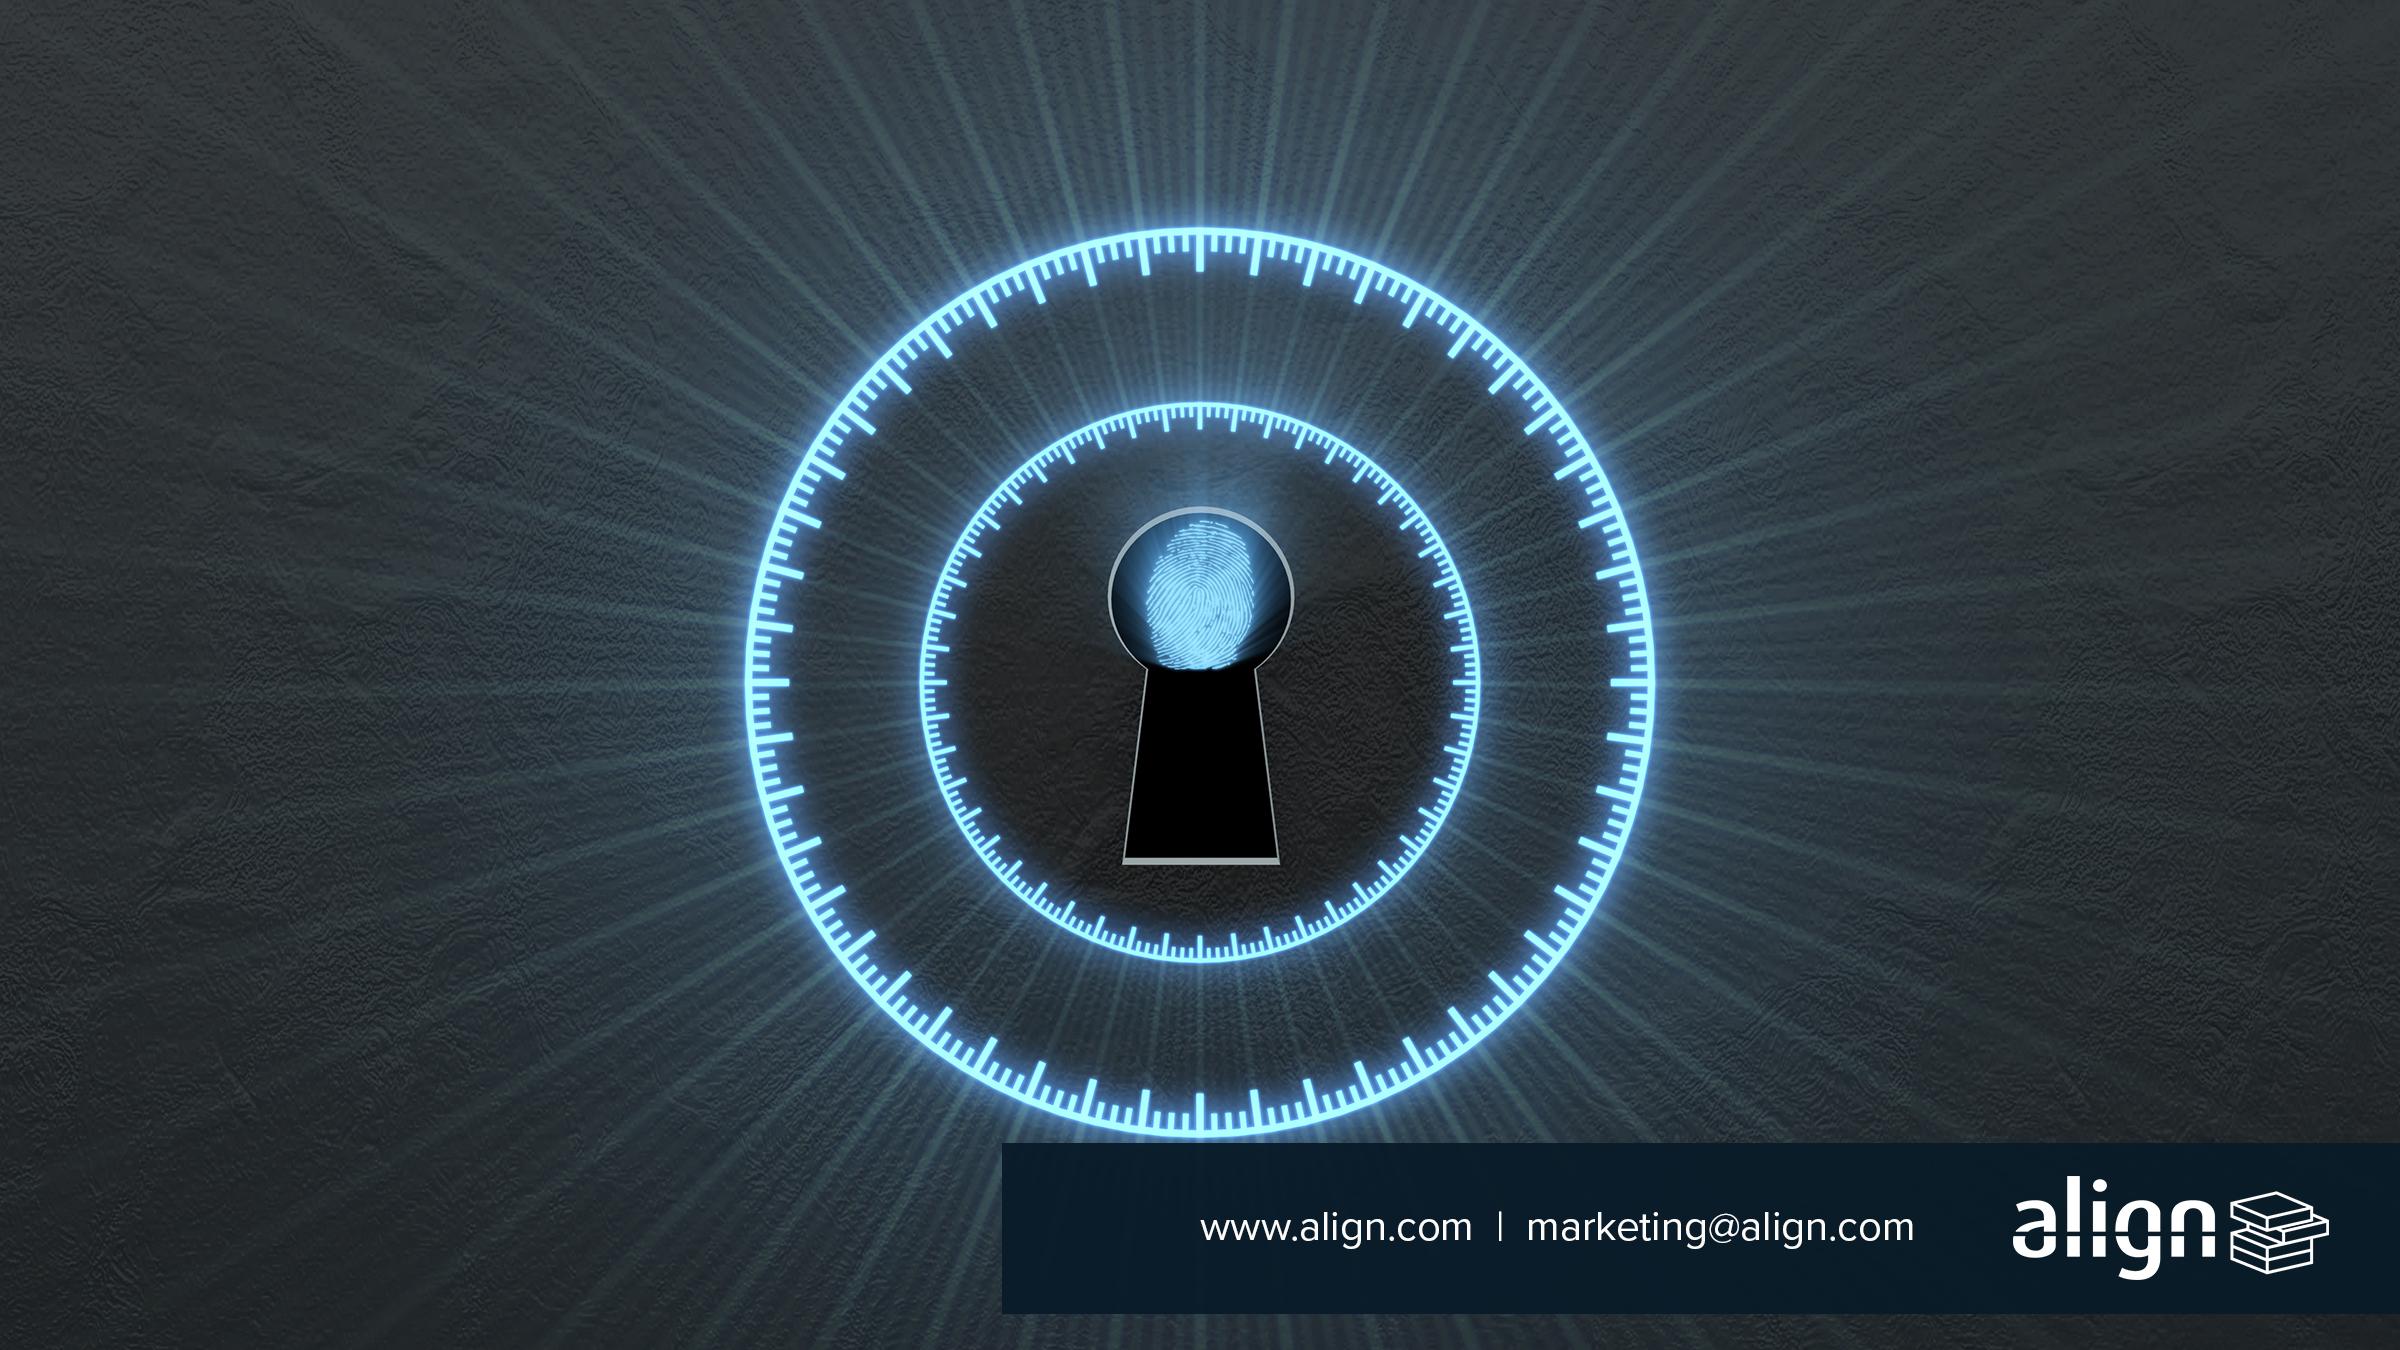 AdobeStock_136533289_Align_Security_Keyhole_Fingerprint